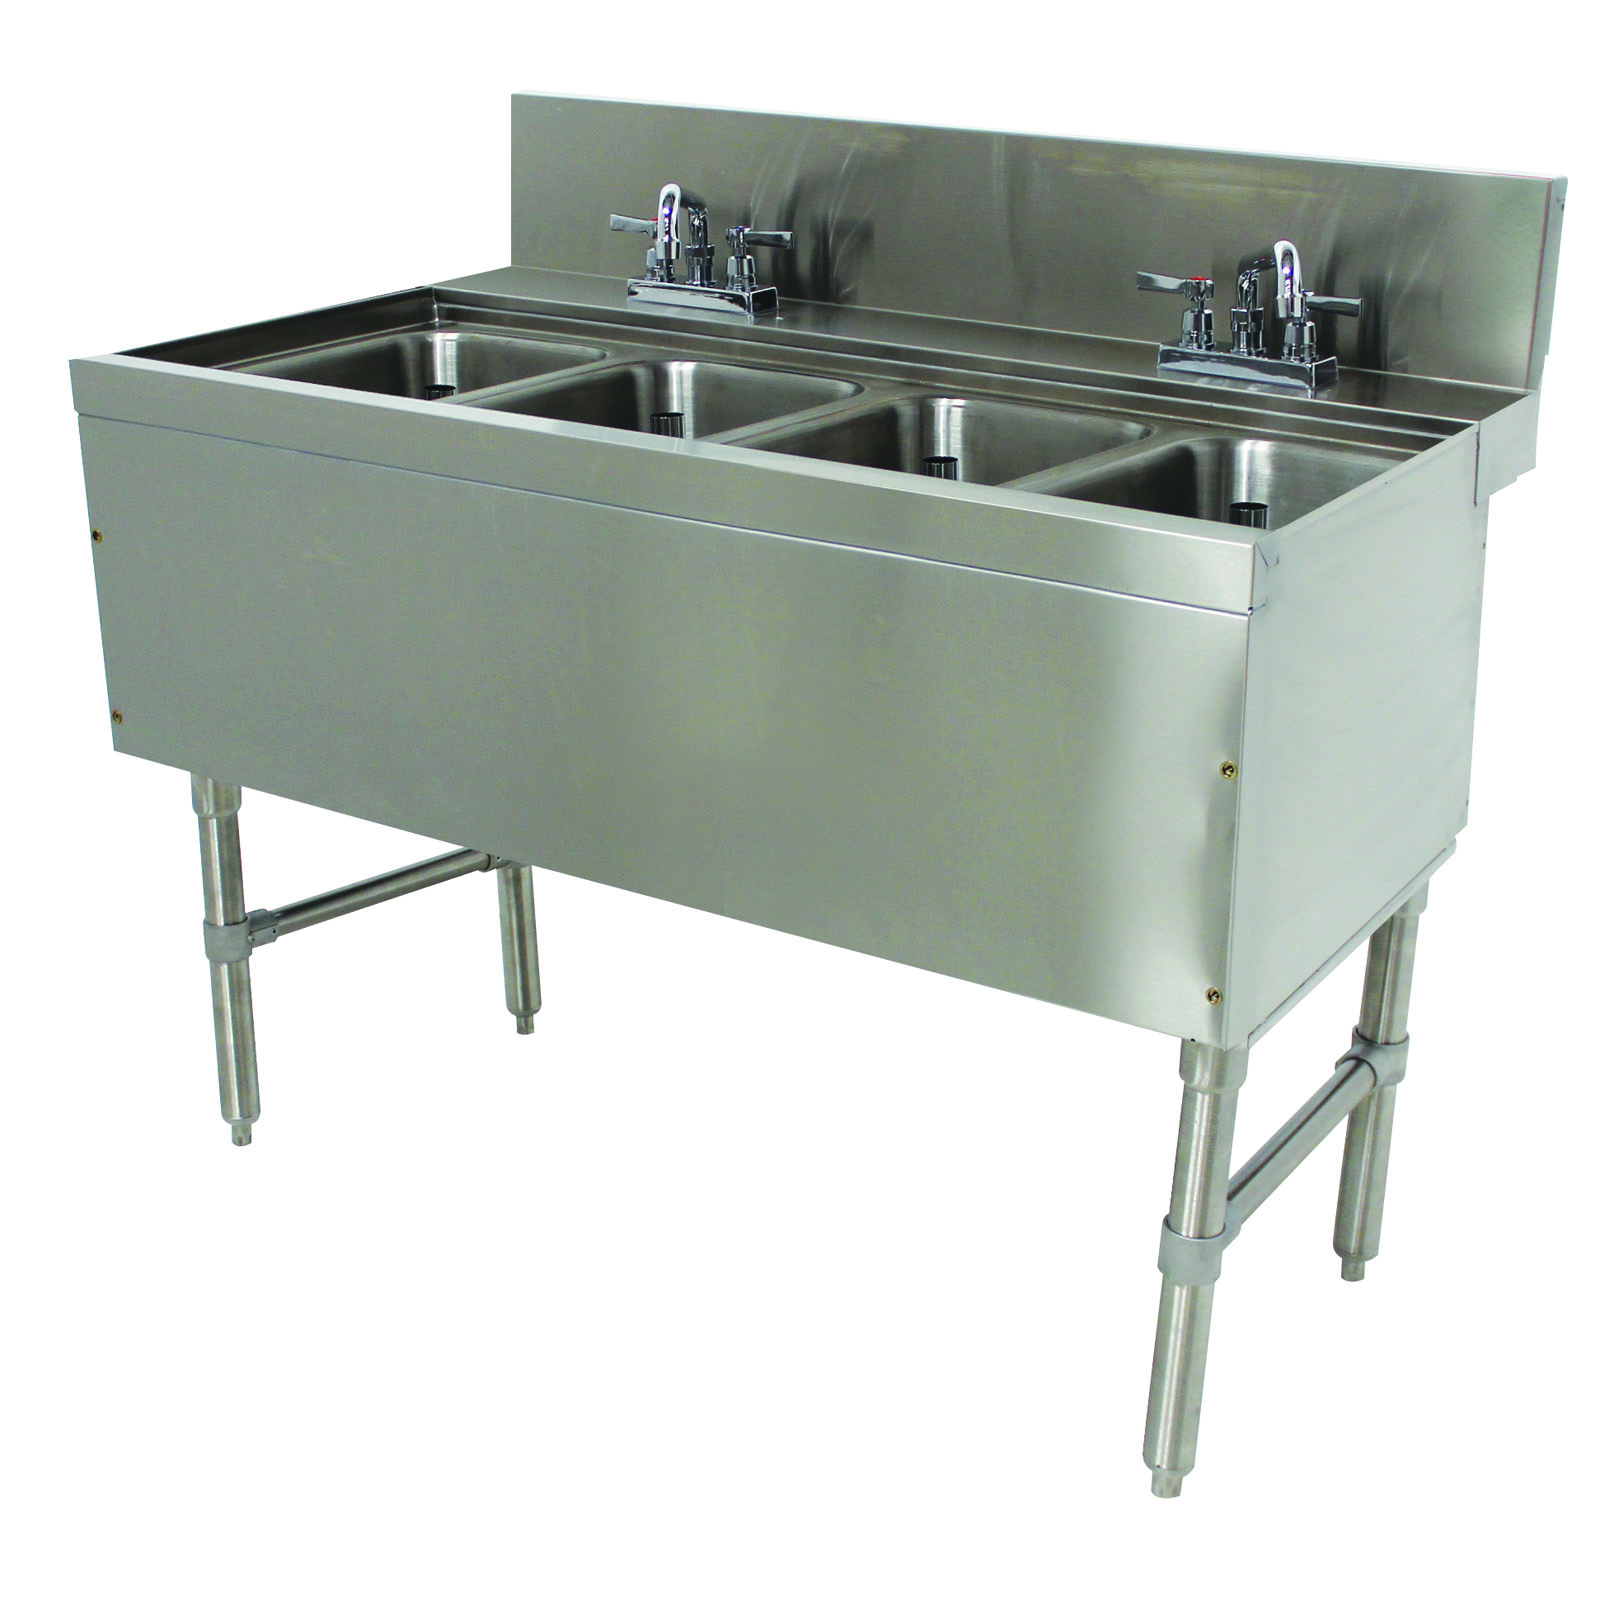 Advance Tabco PRB-24-44C underbar sink units